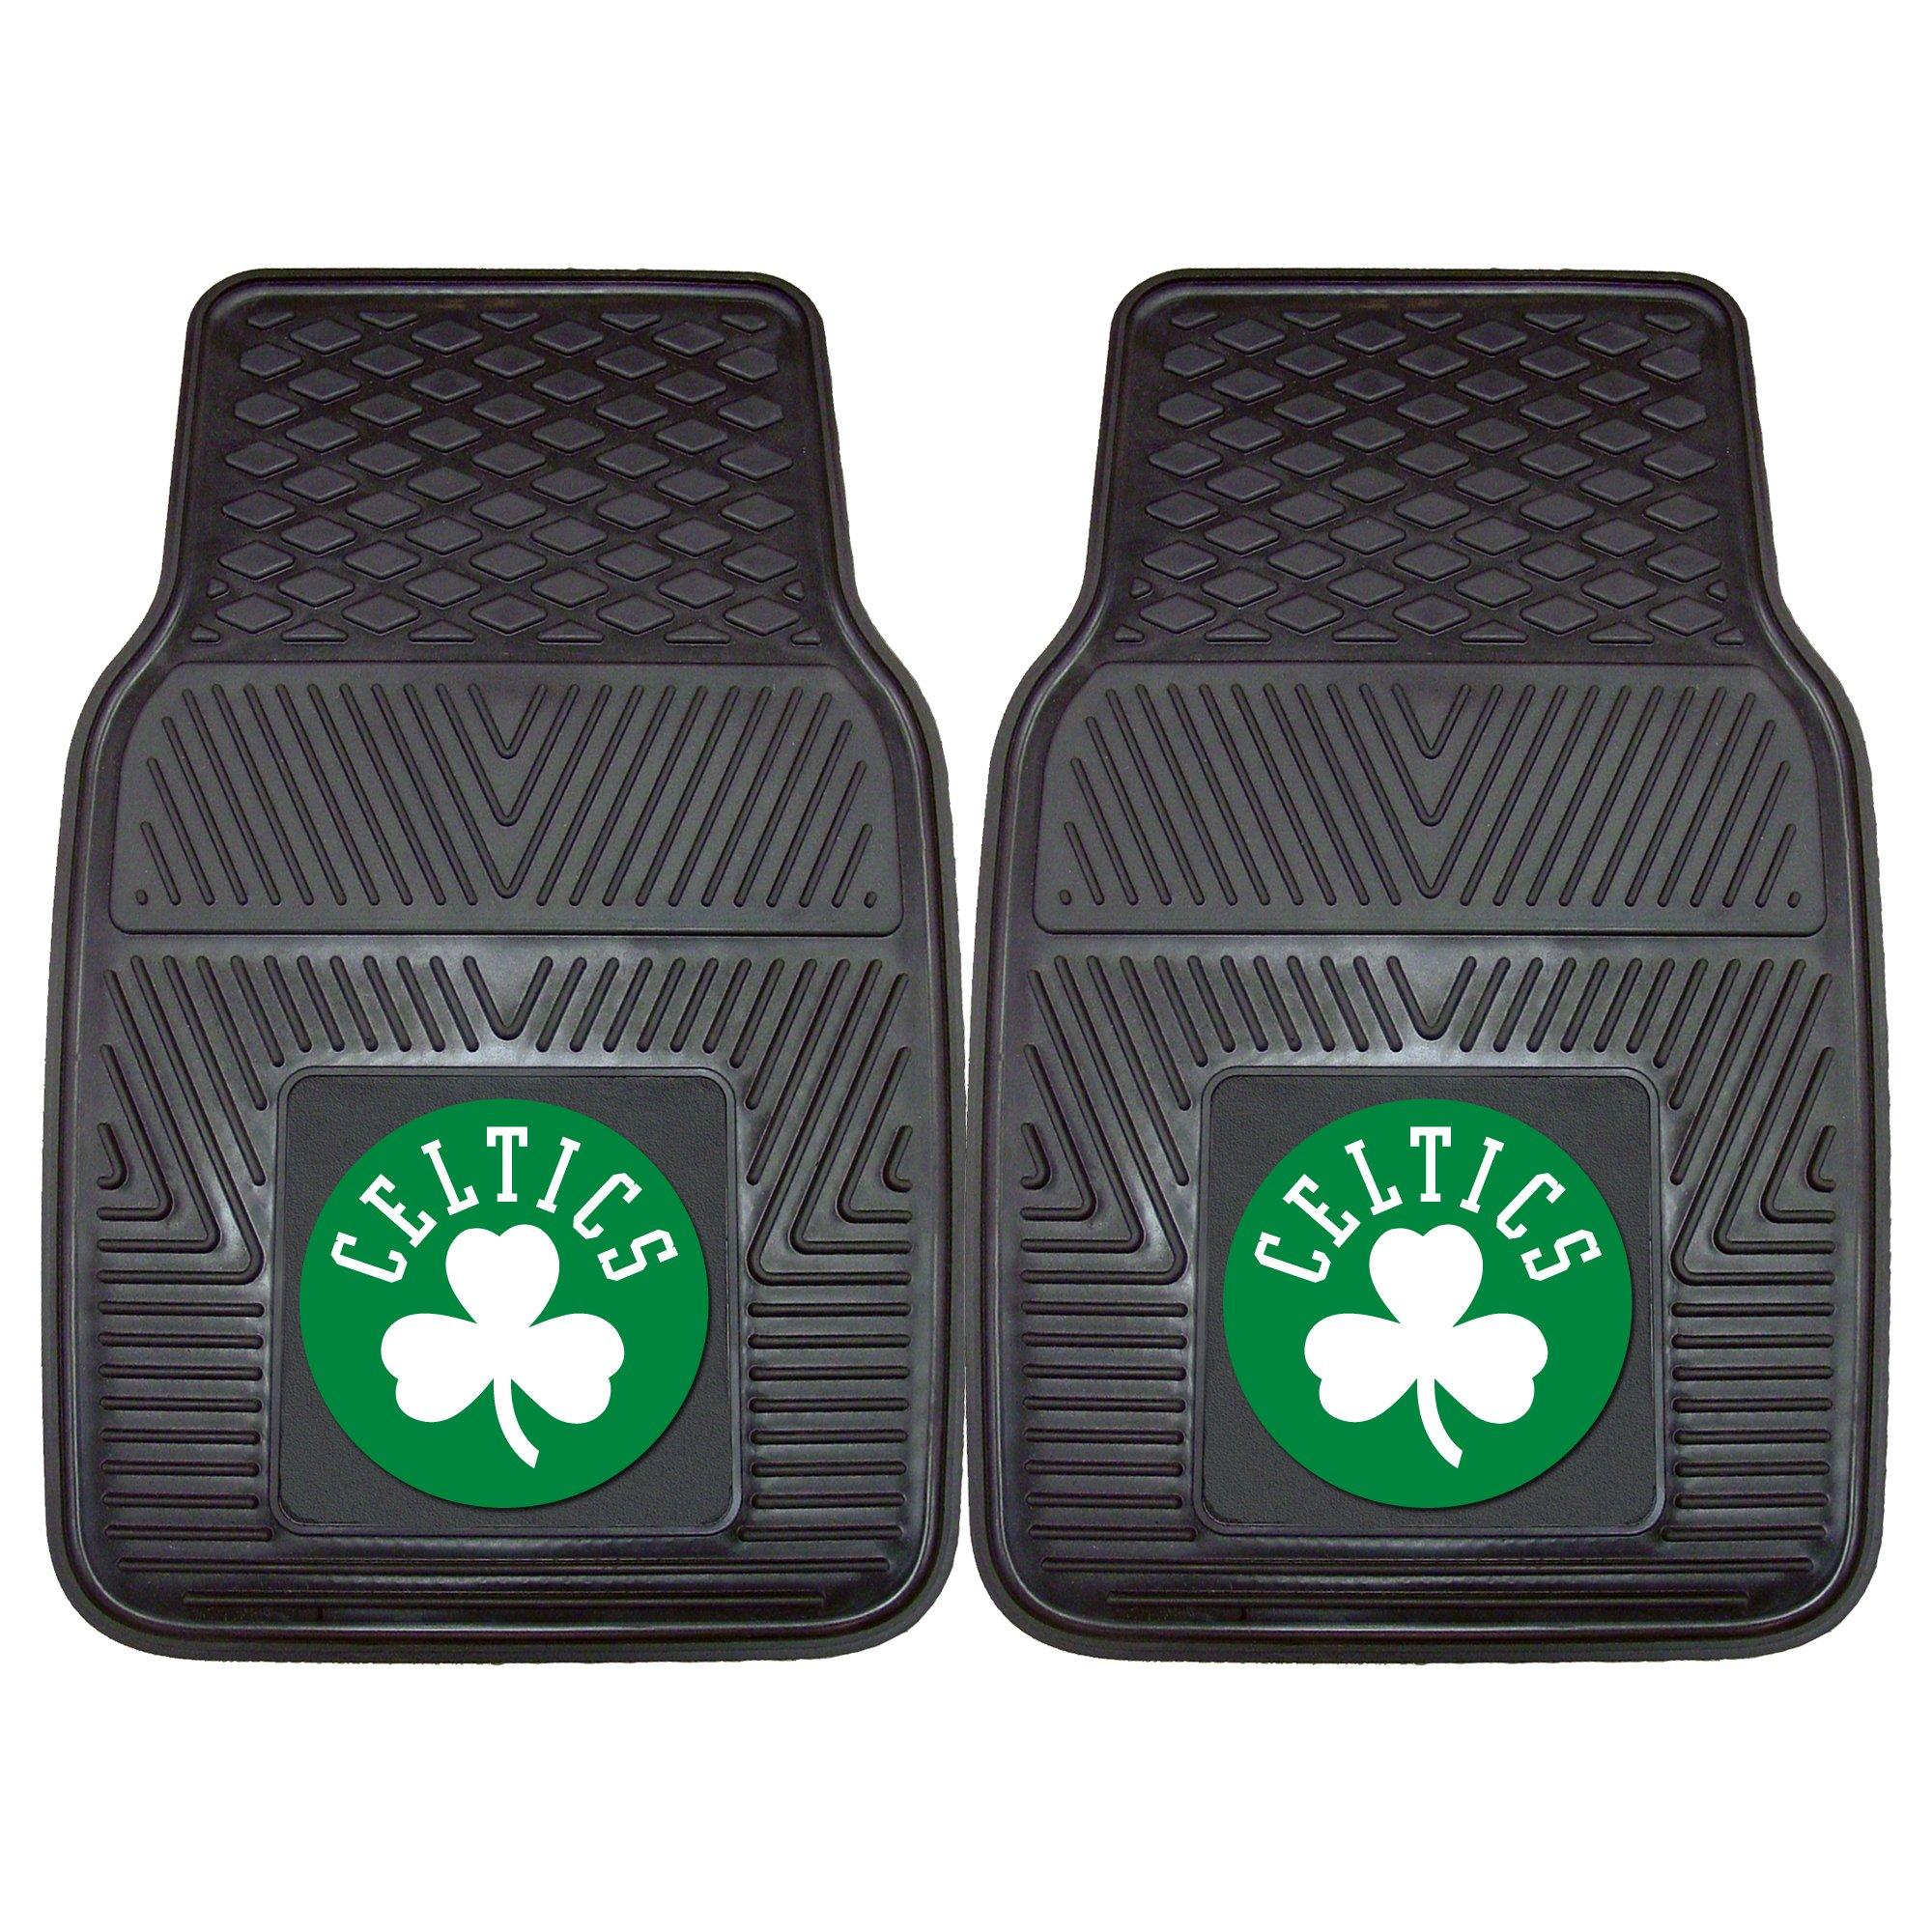 FANMATS NBA Boston Celtics Vinyl Heavy Duty Car Mat by Fanmats